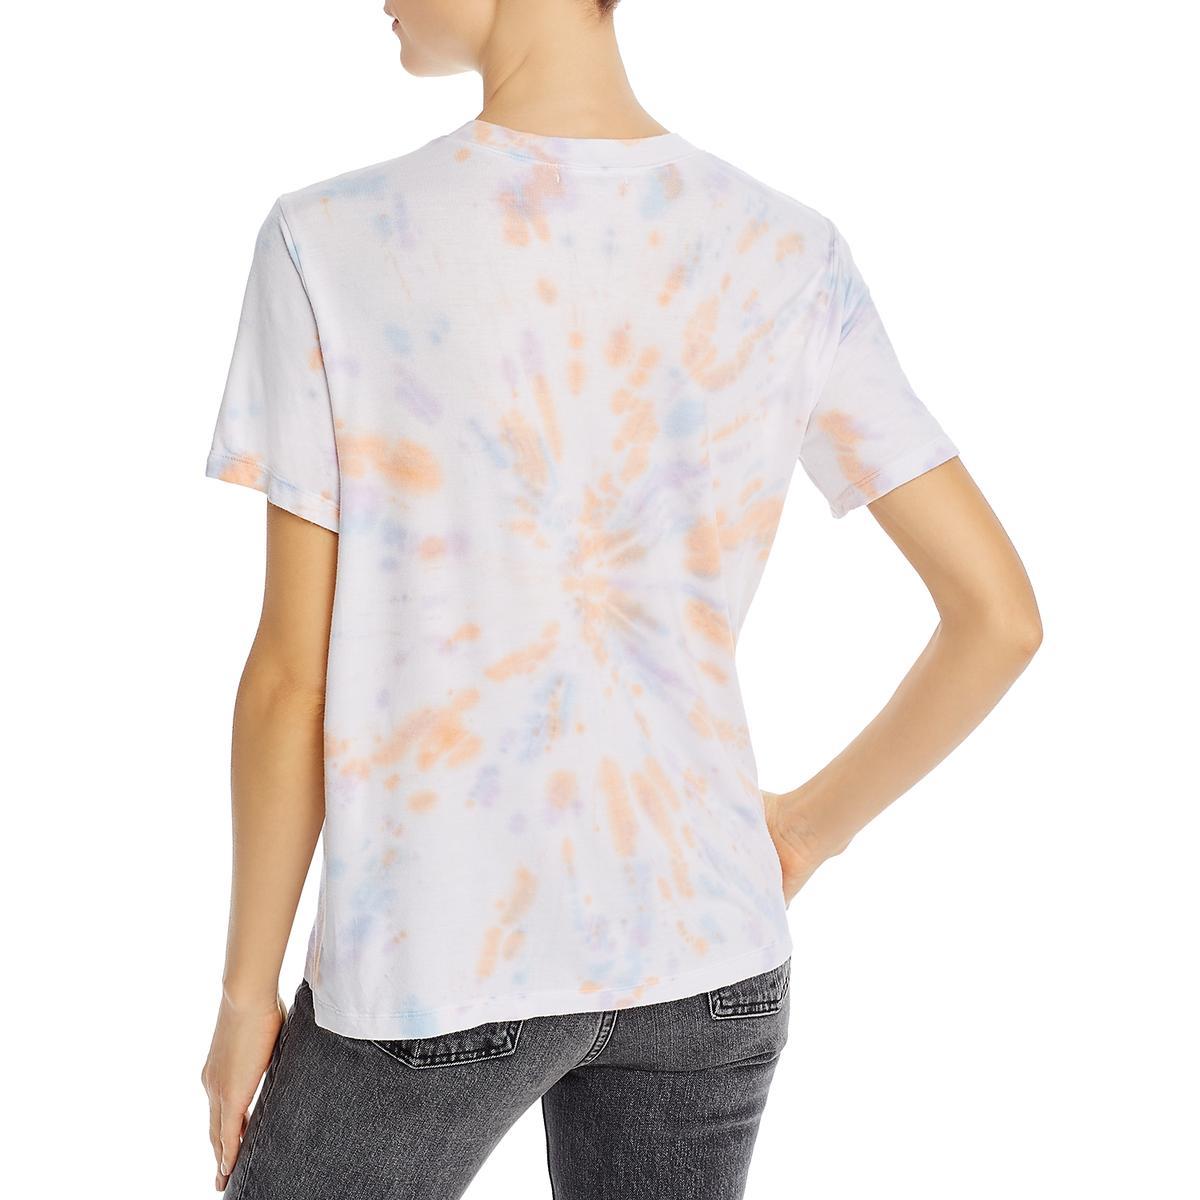 thumbnail 4 - Aqua Womens Oversized Tie Dye Crewneck T-Shirt Top BHFO 4407